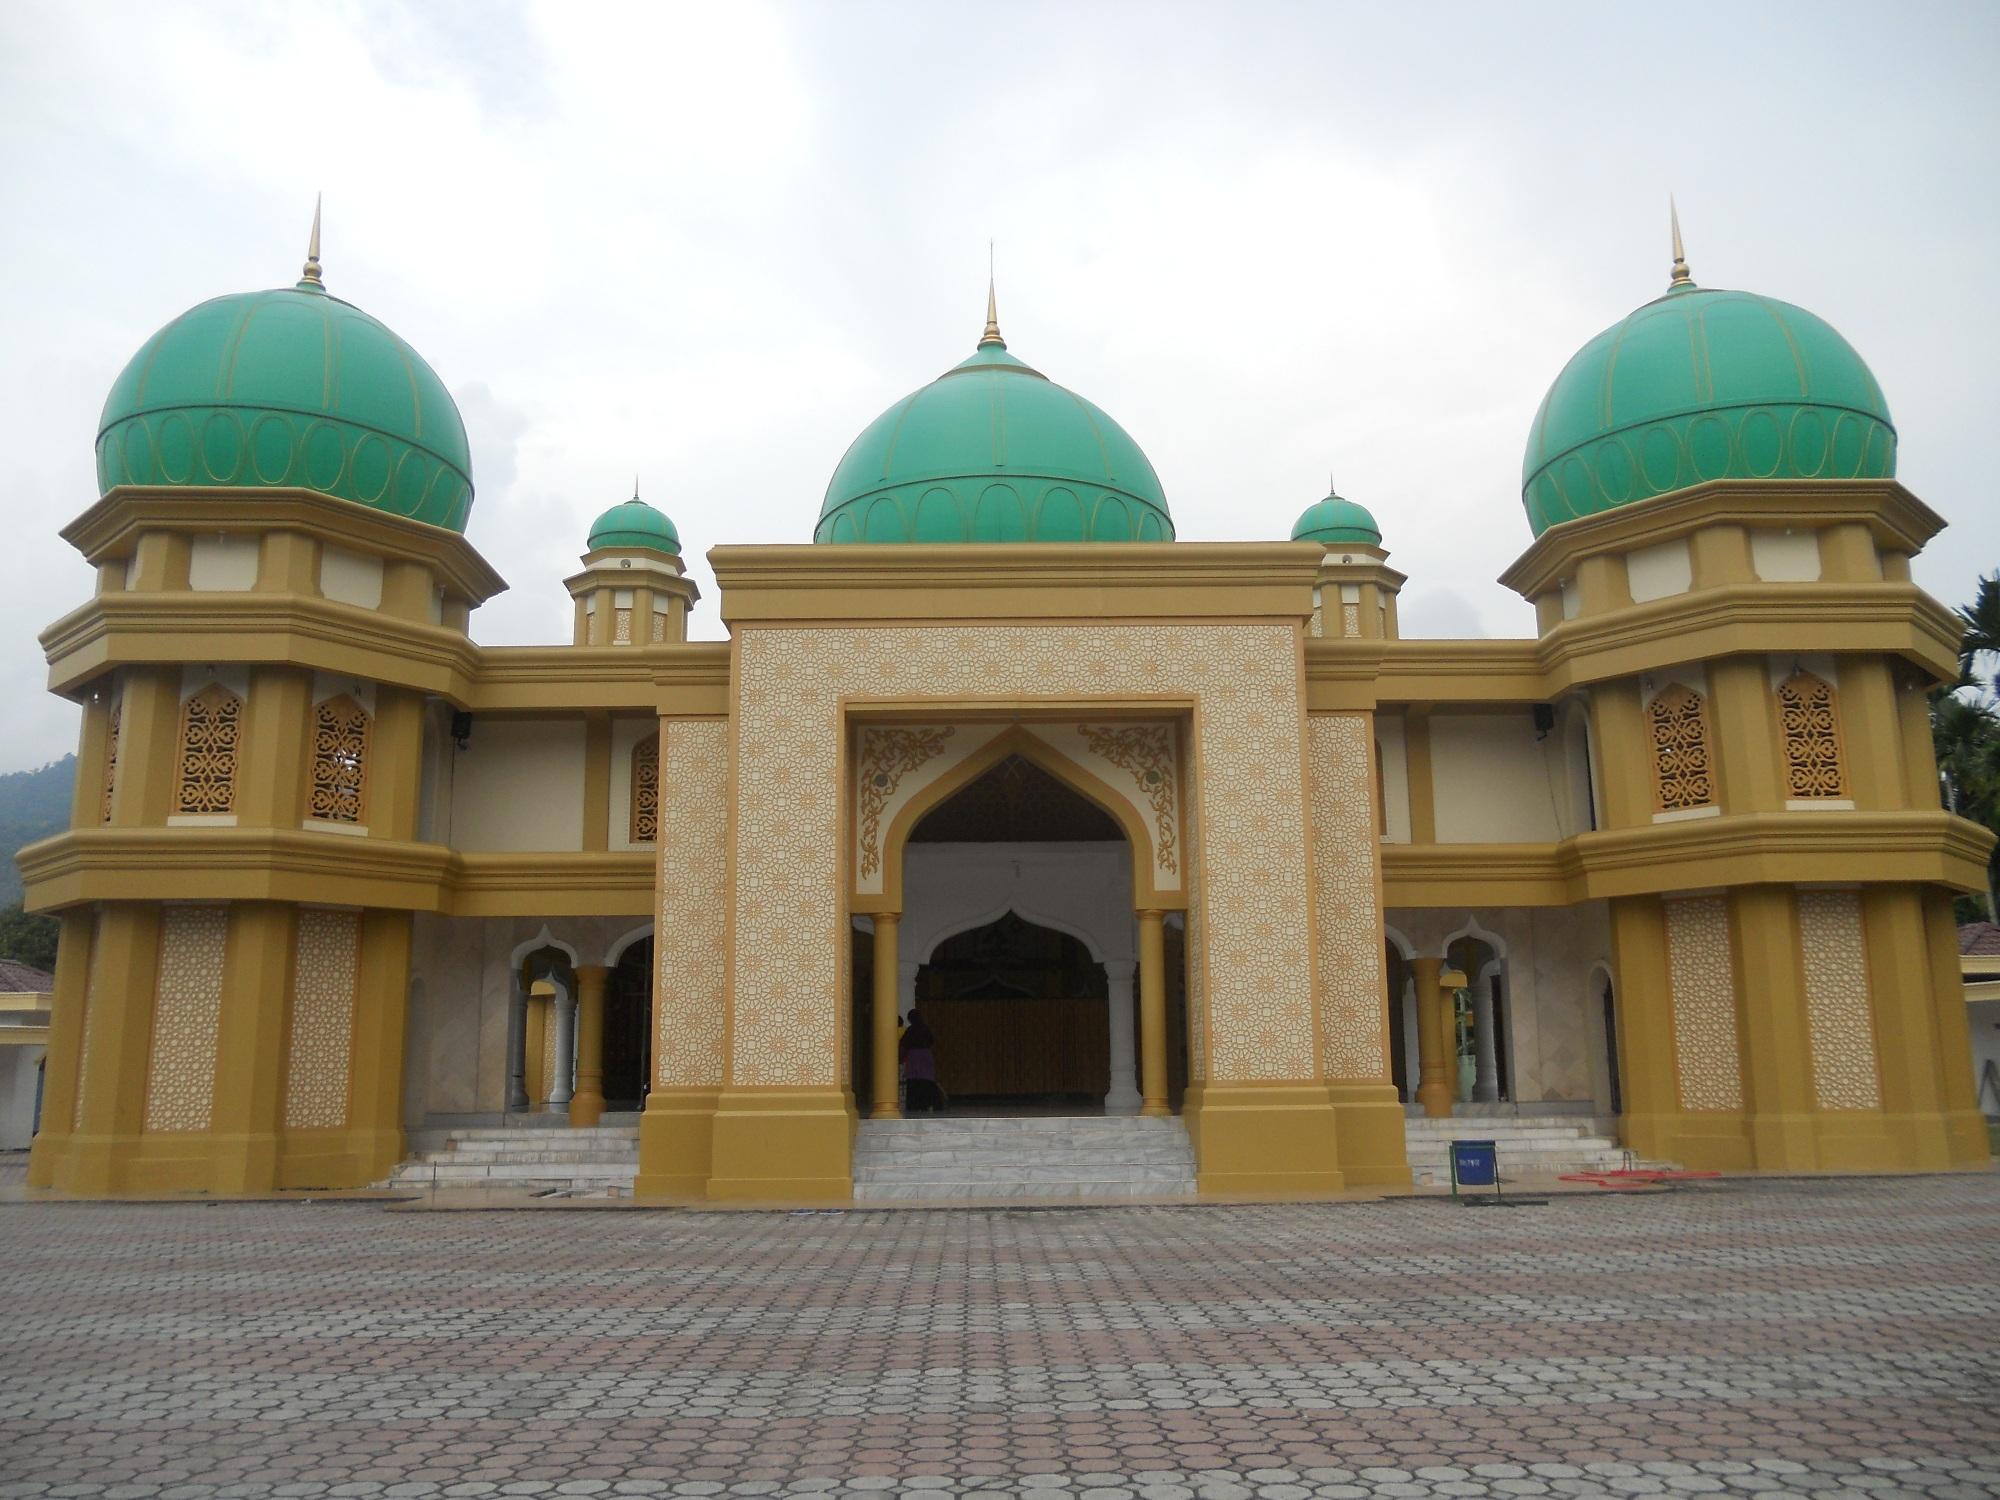 Sistem Informasi Masjid Indonesia Profil Mushalla Berdiri 1995 Terjadnya Tragedi